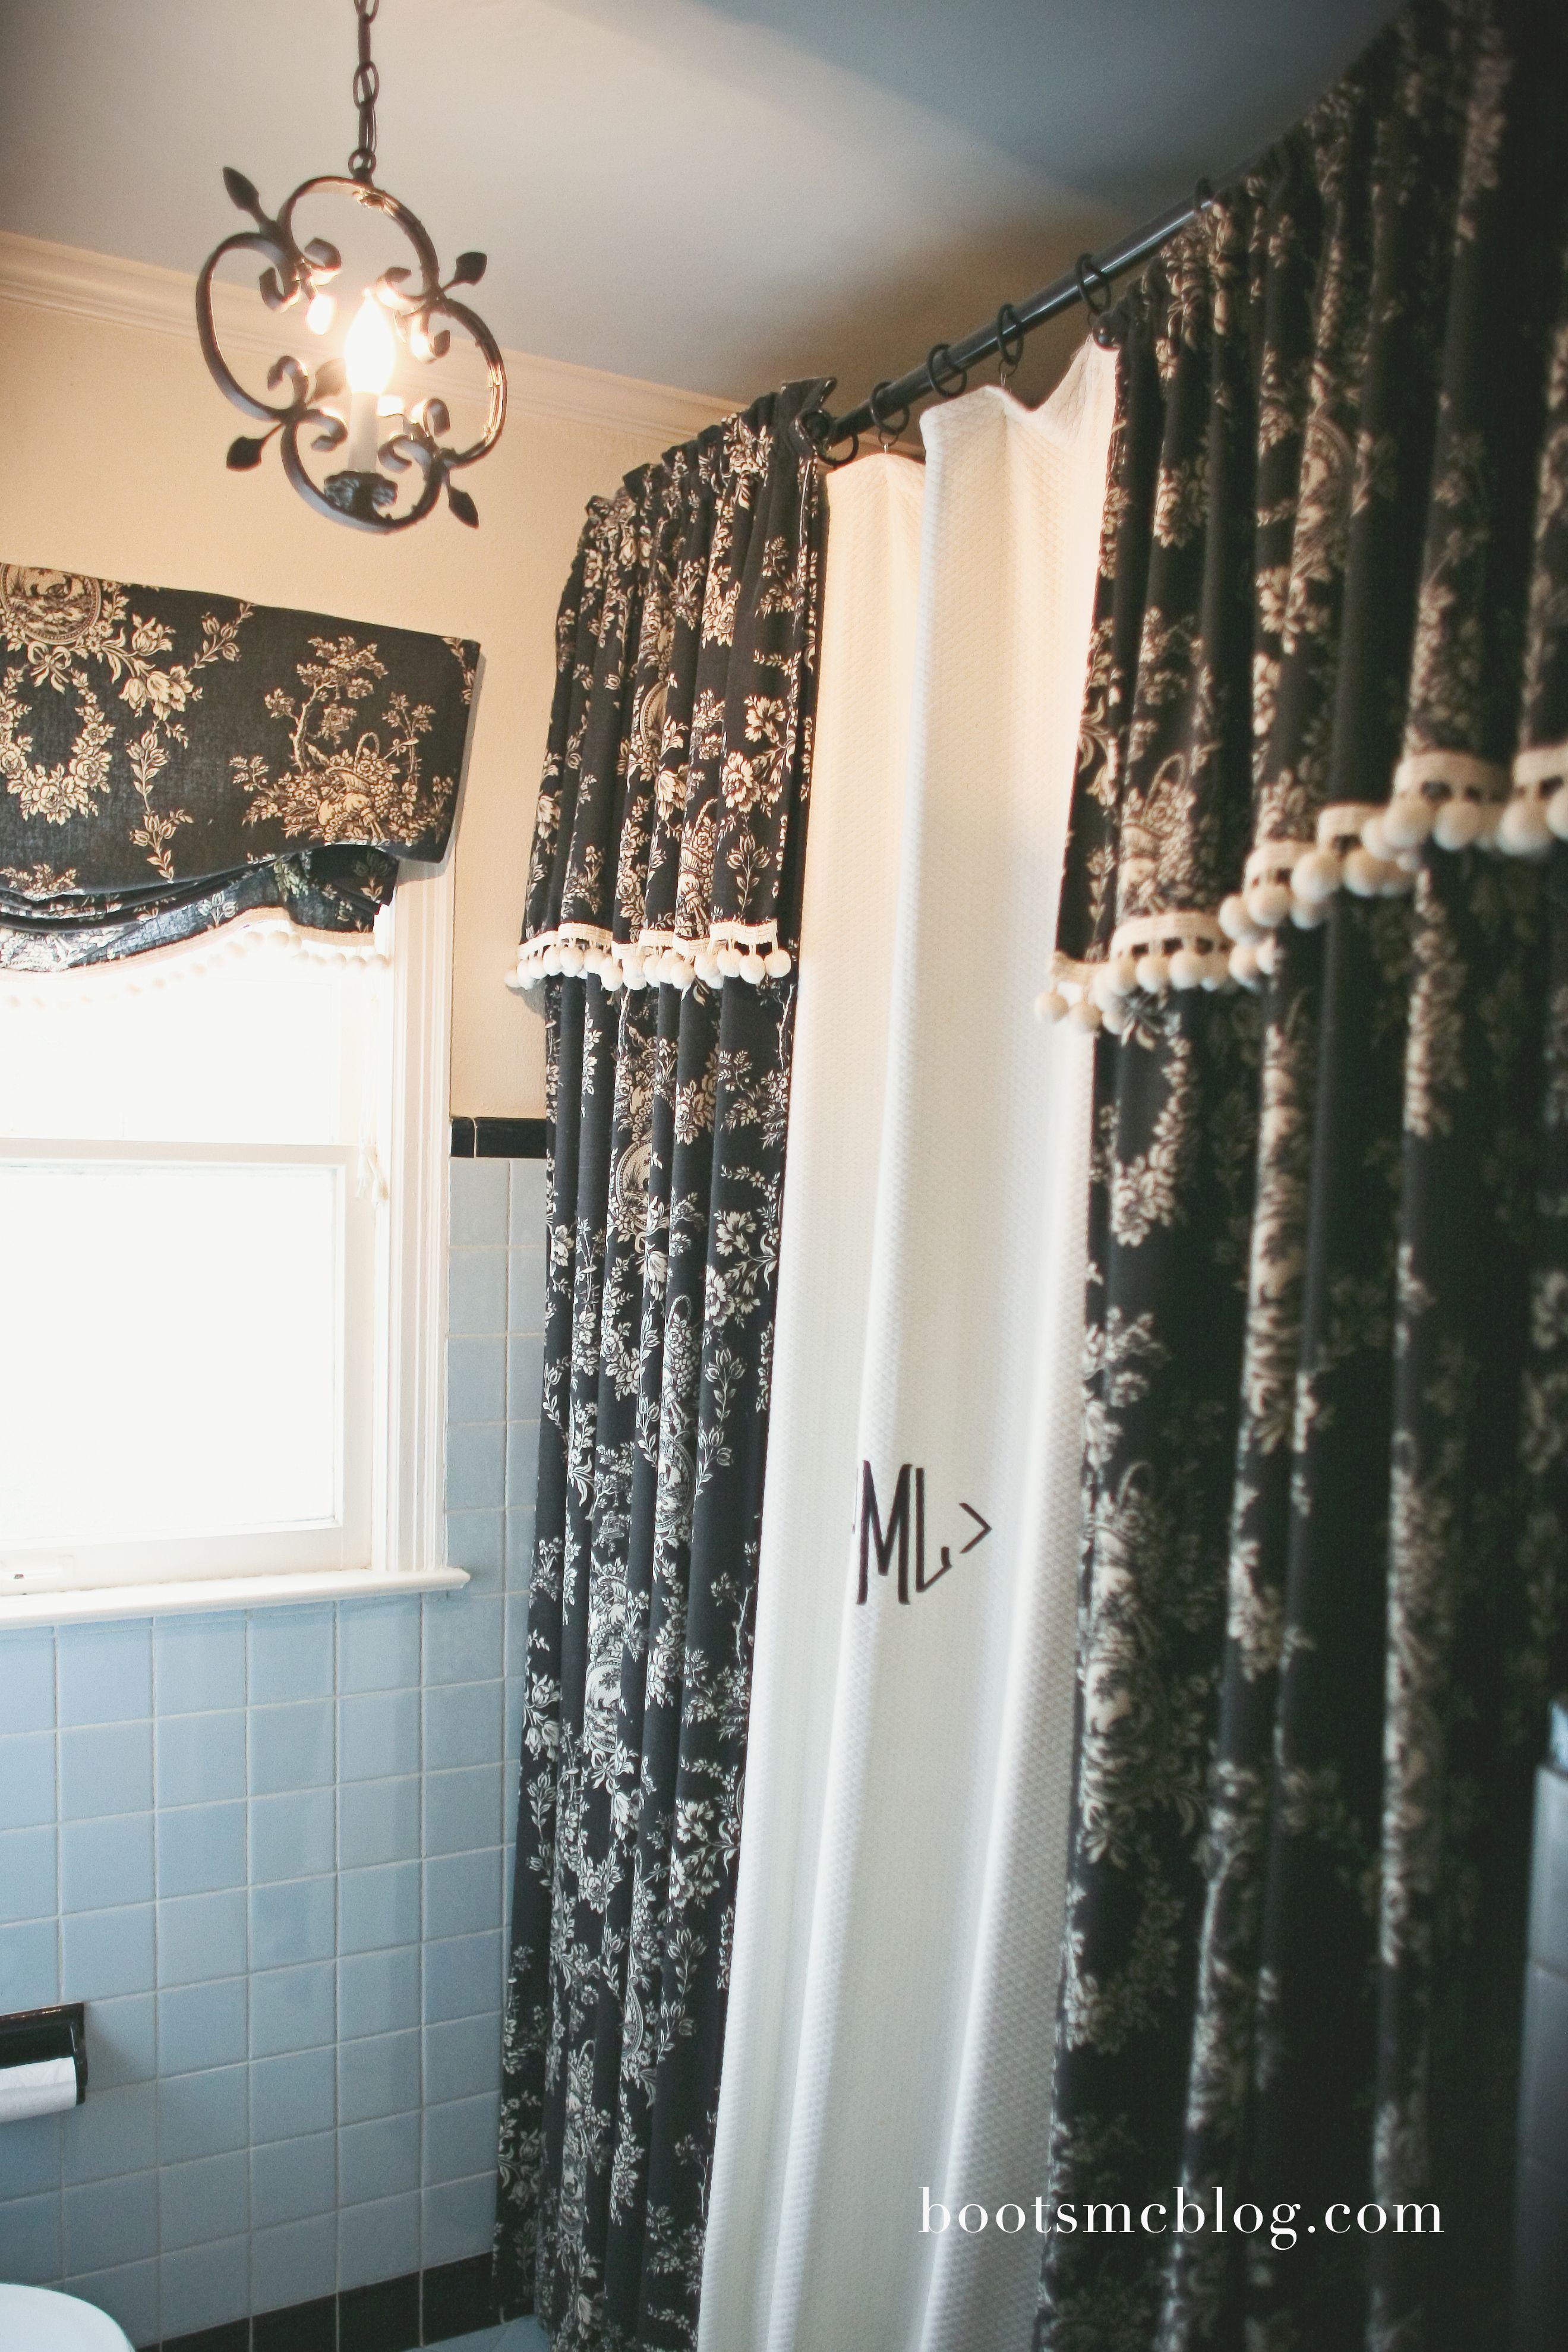 ideas toile size and curtainsred design of gold drapesred lsu curtains andrtains red curtain home dreaded photo ebay drapesebay drapes full